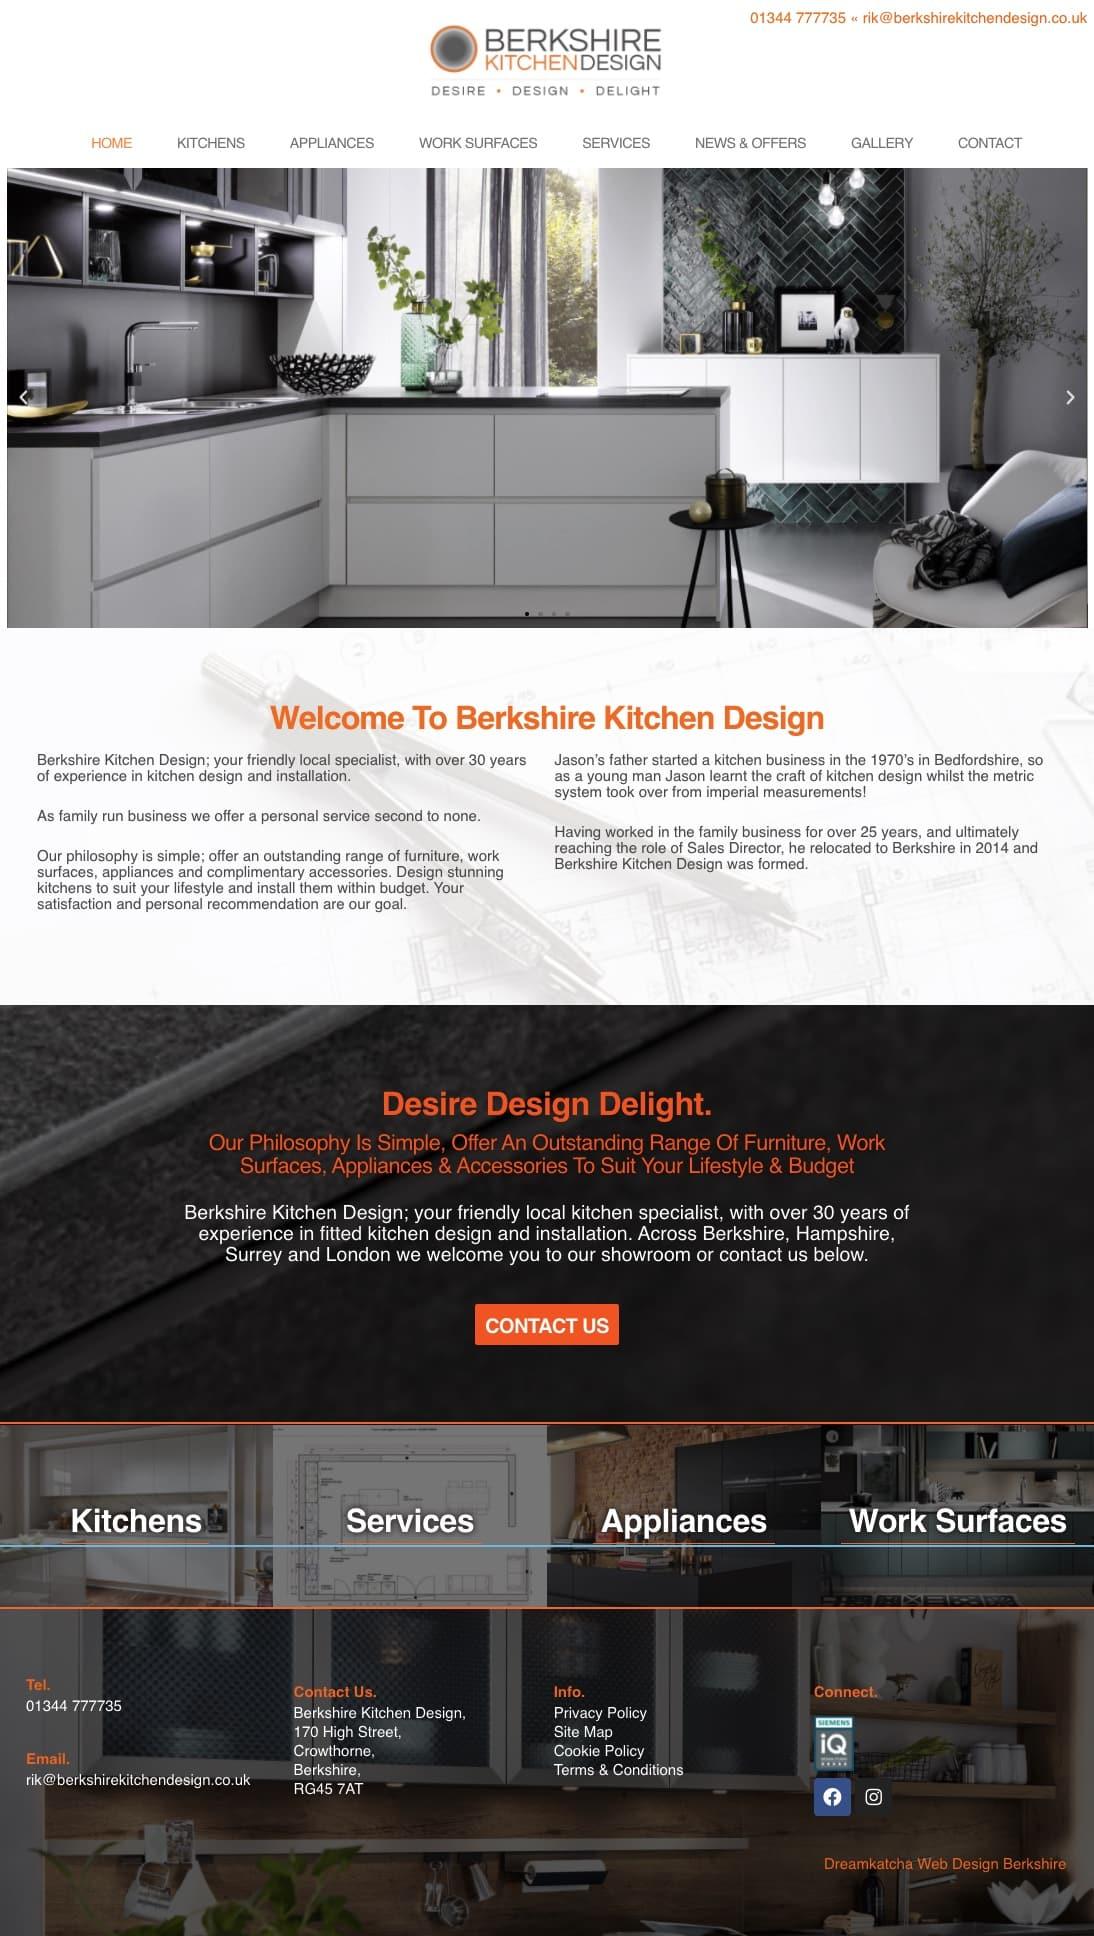 Web designer in Crowthorne